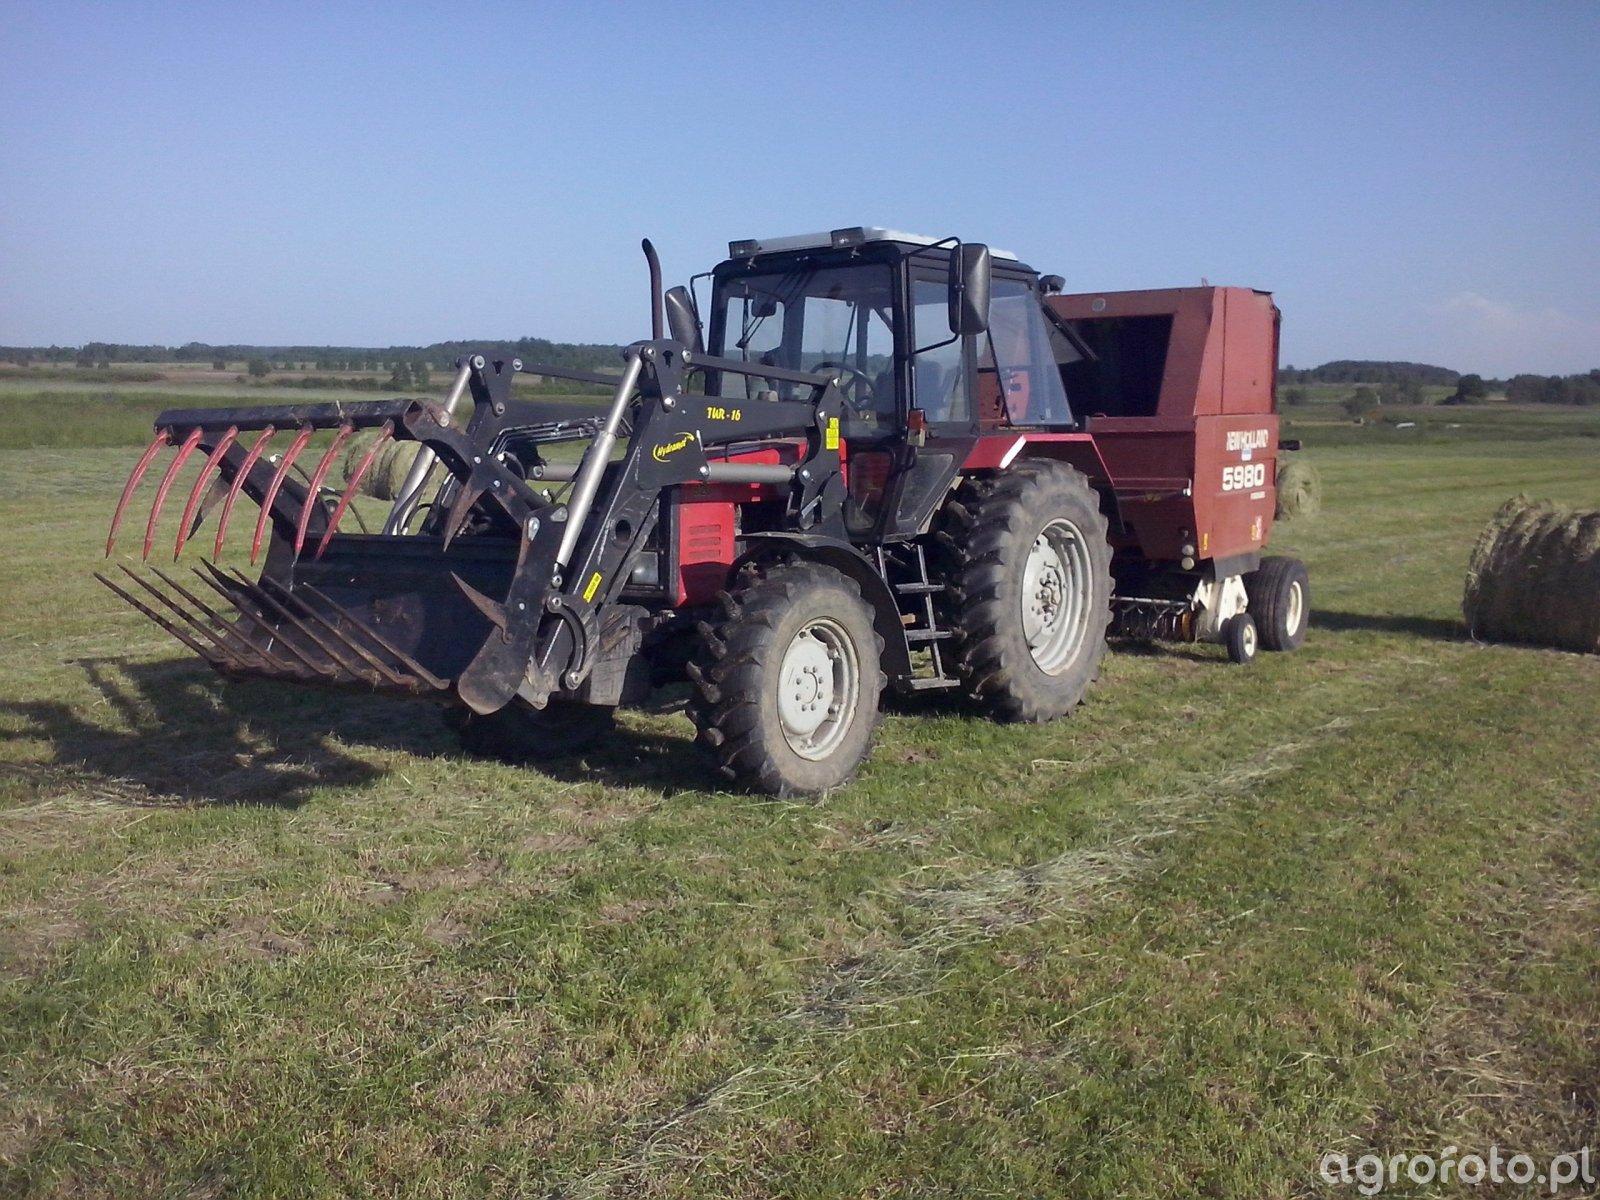 MTZ Belarus 820.3 + Tur16 Hydramet + New Holland 5980